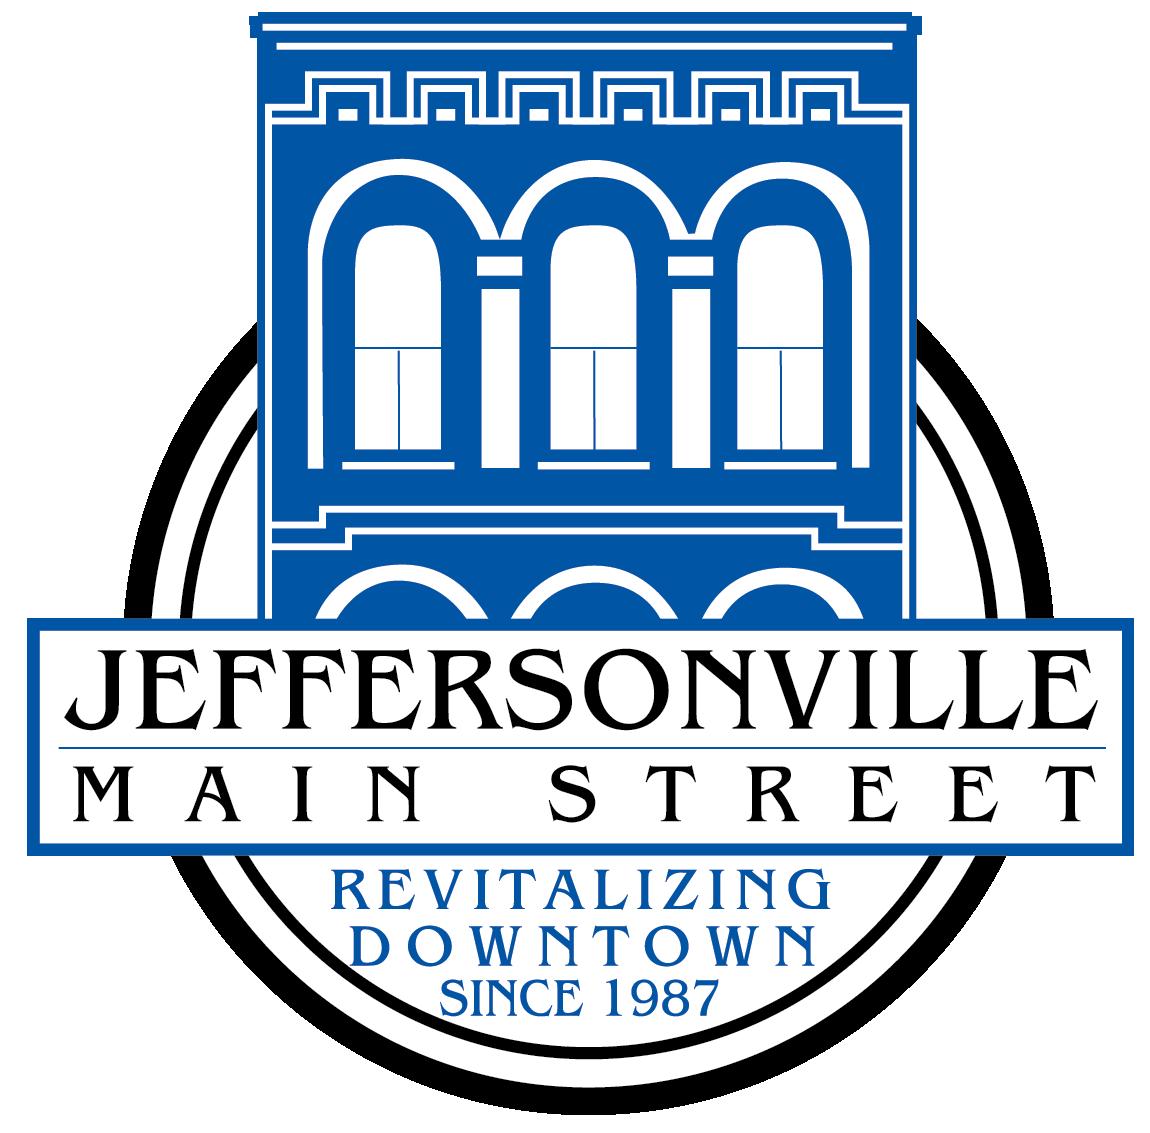 Jeffersonville restaurants pubs coffee. Clipart restaurant downtown building